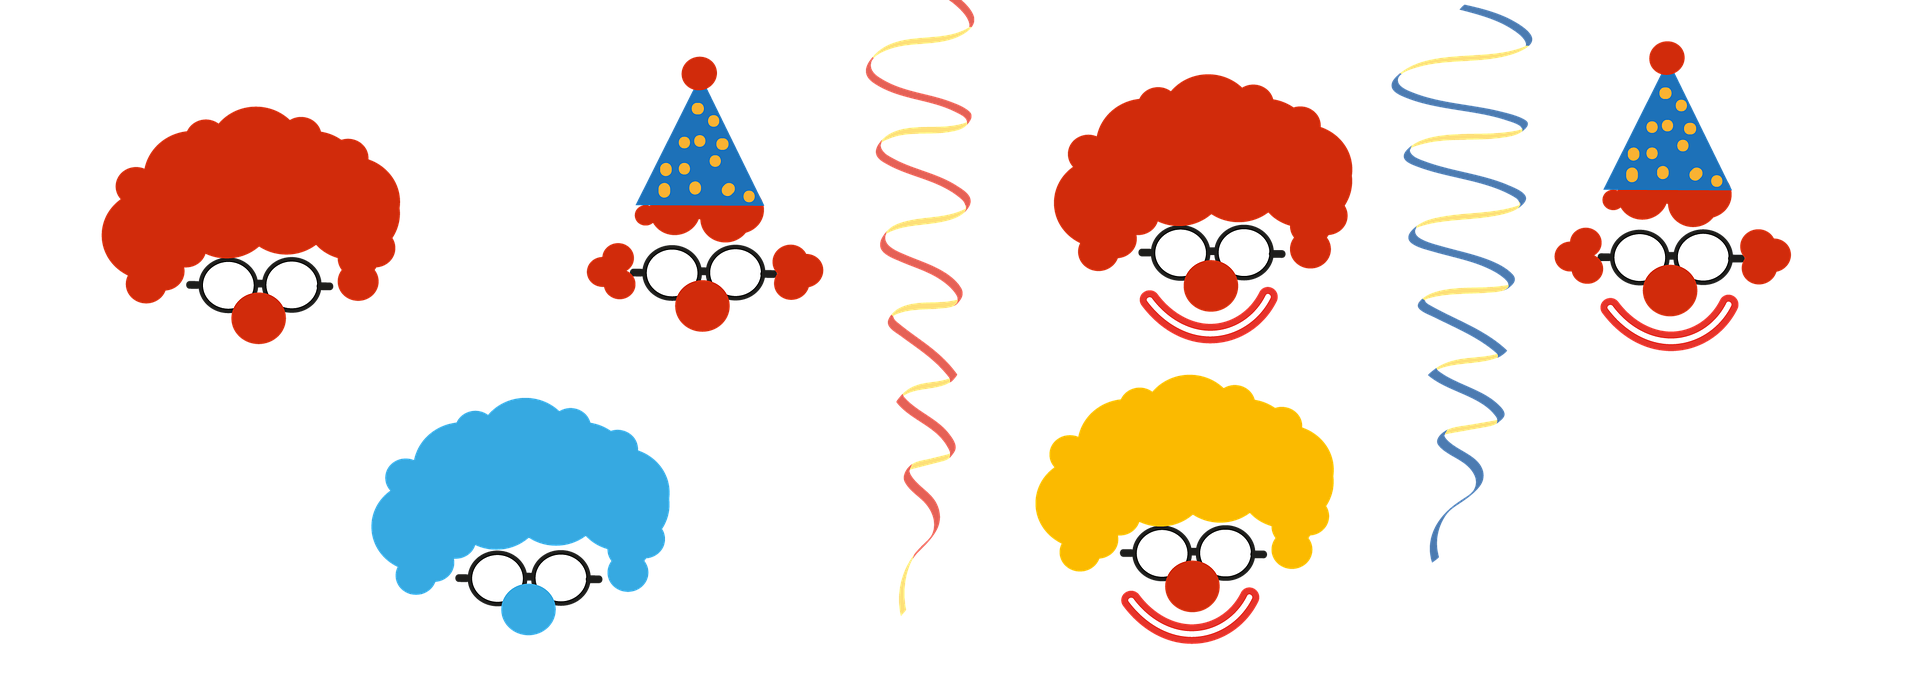 Karnevalspause